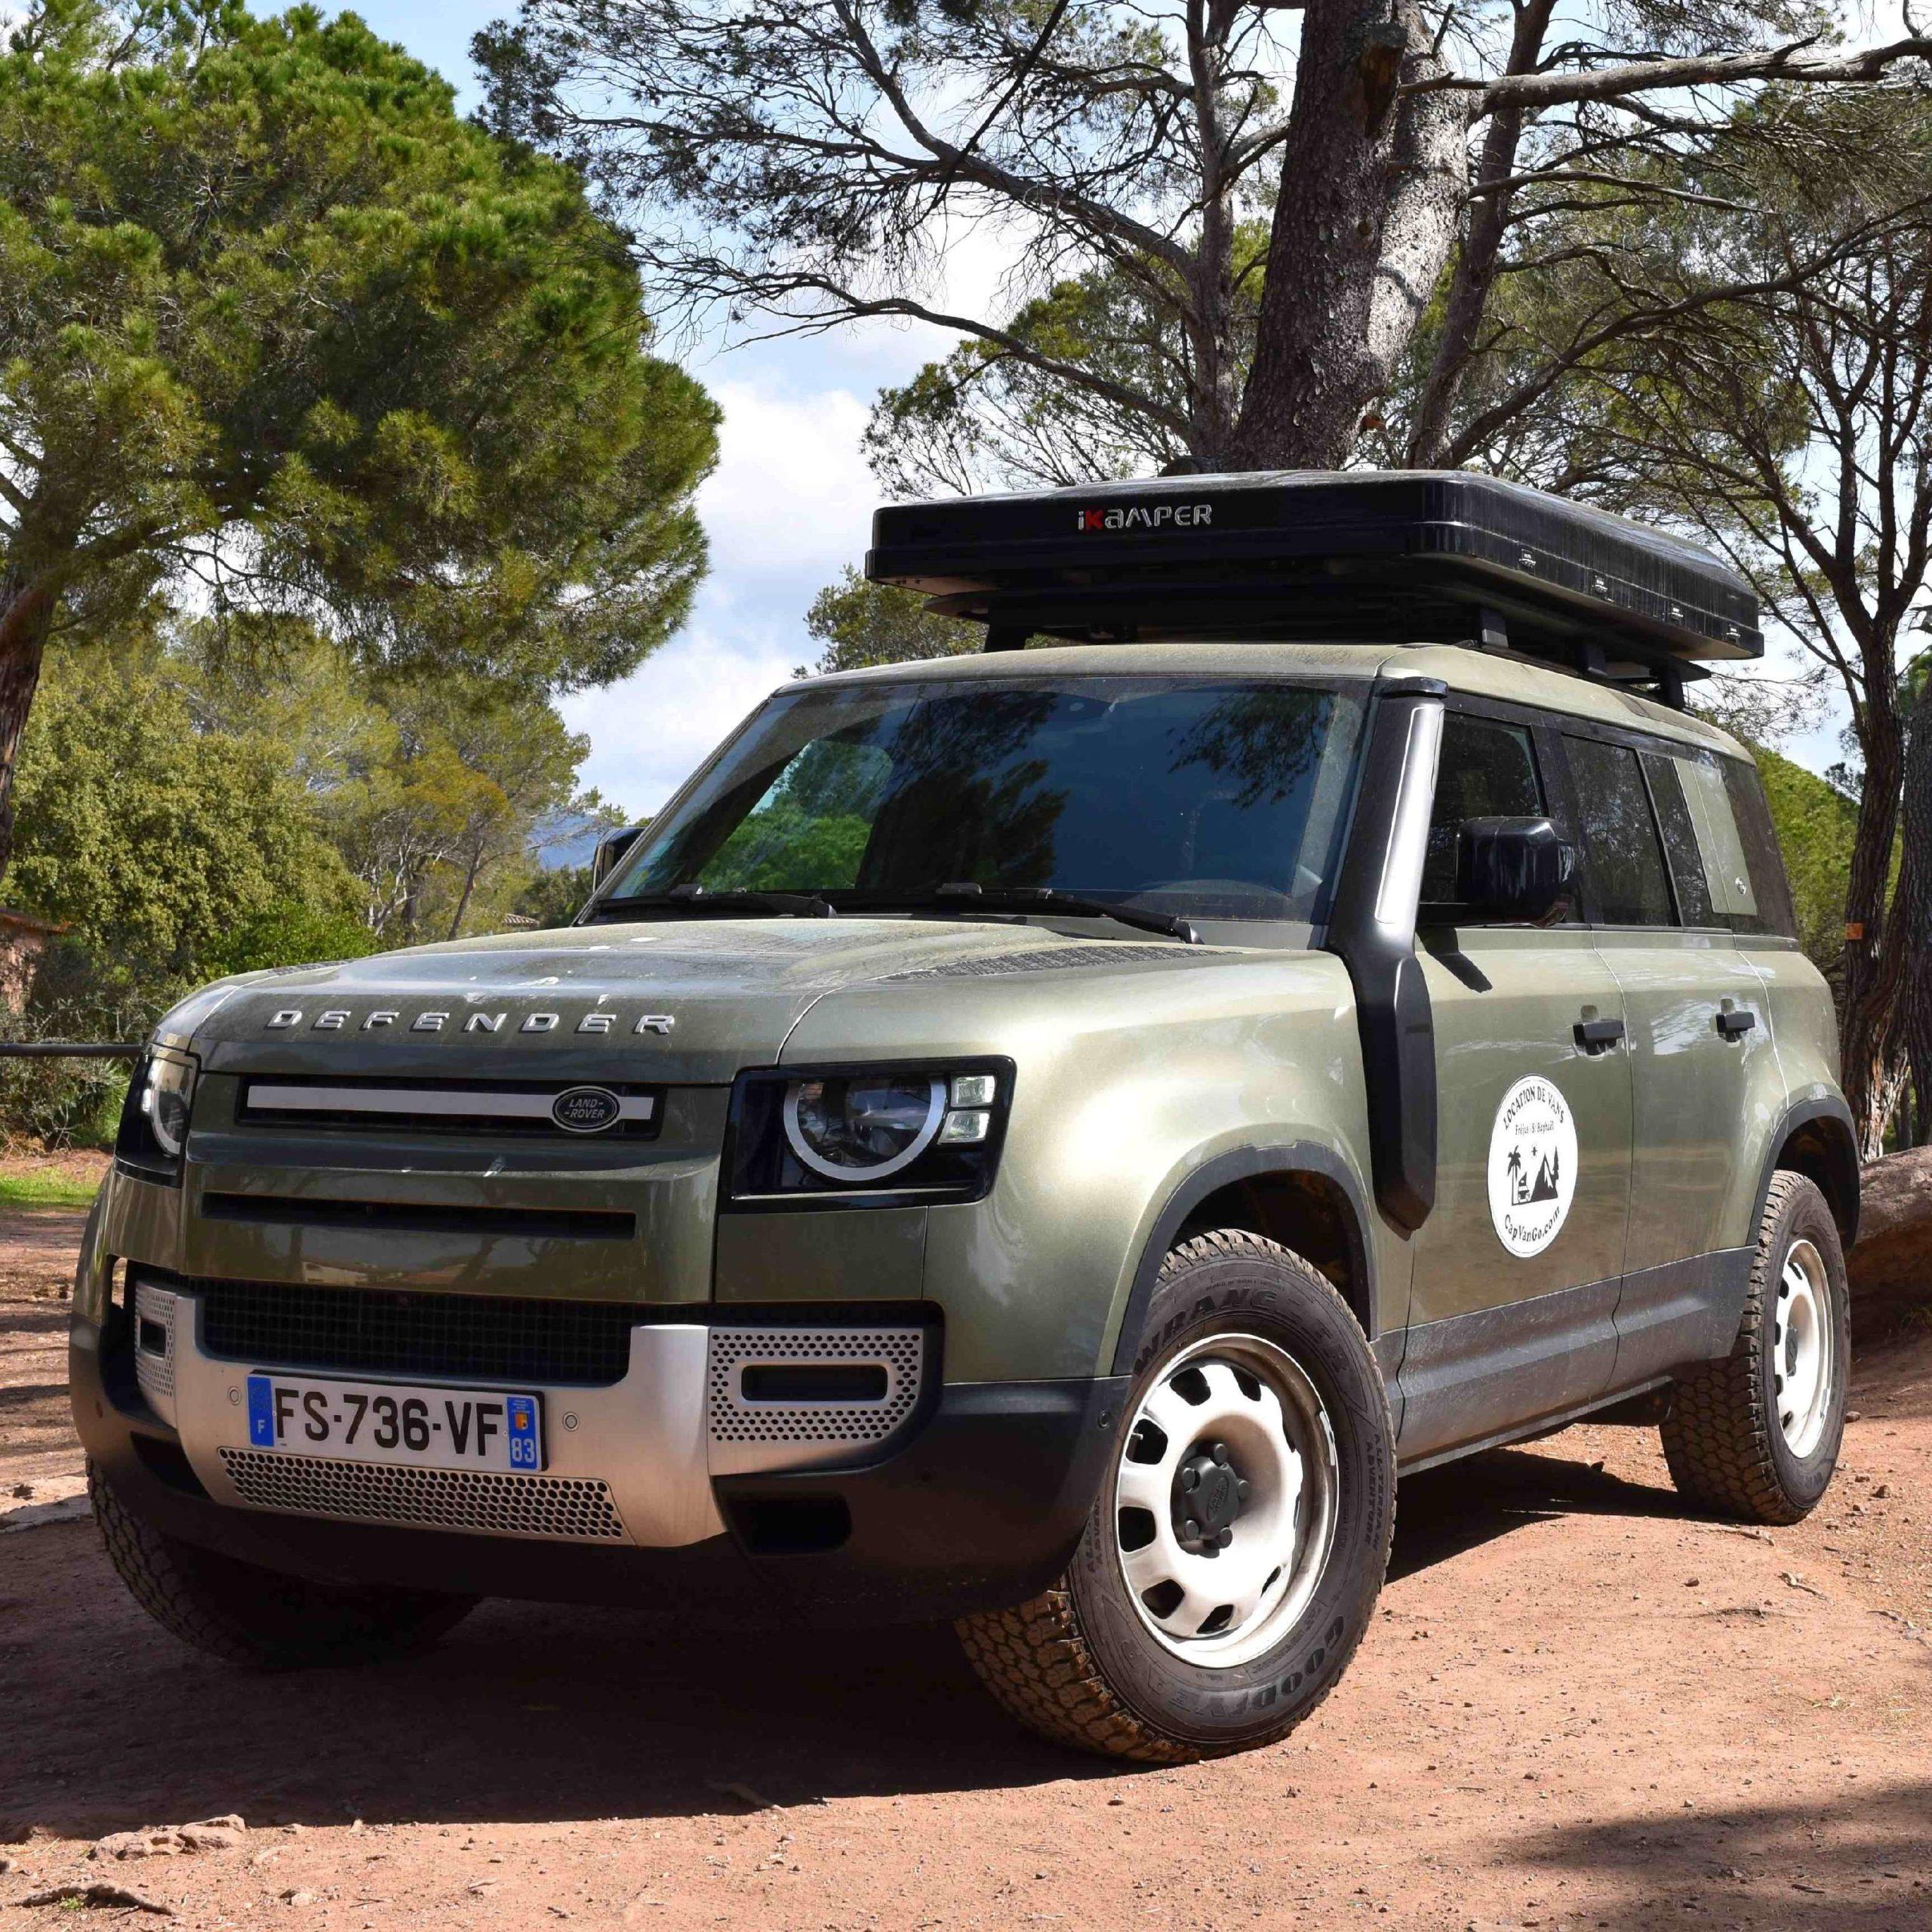 Van Land Rover Defender